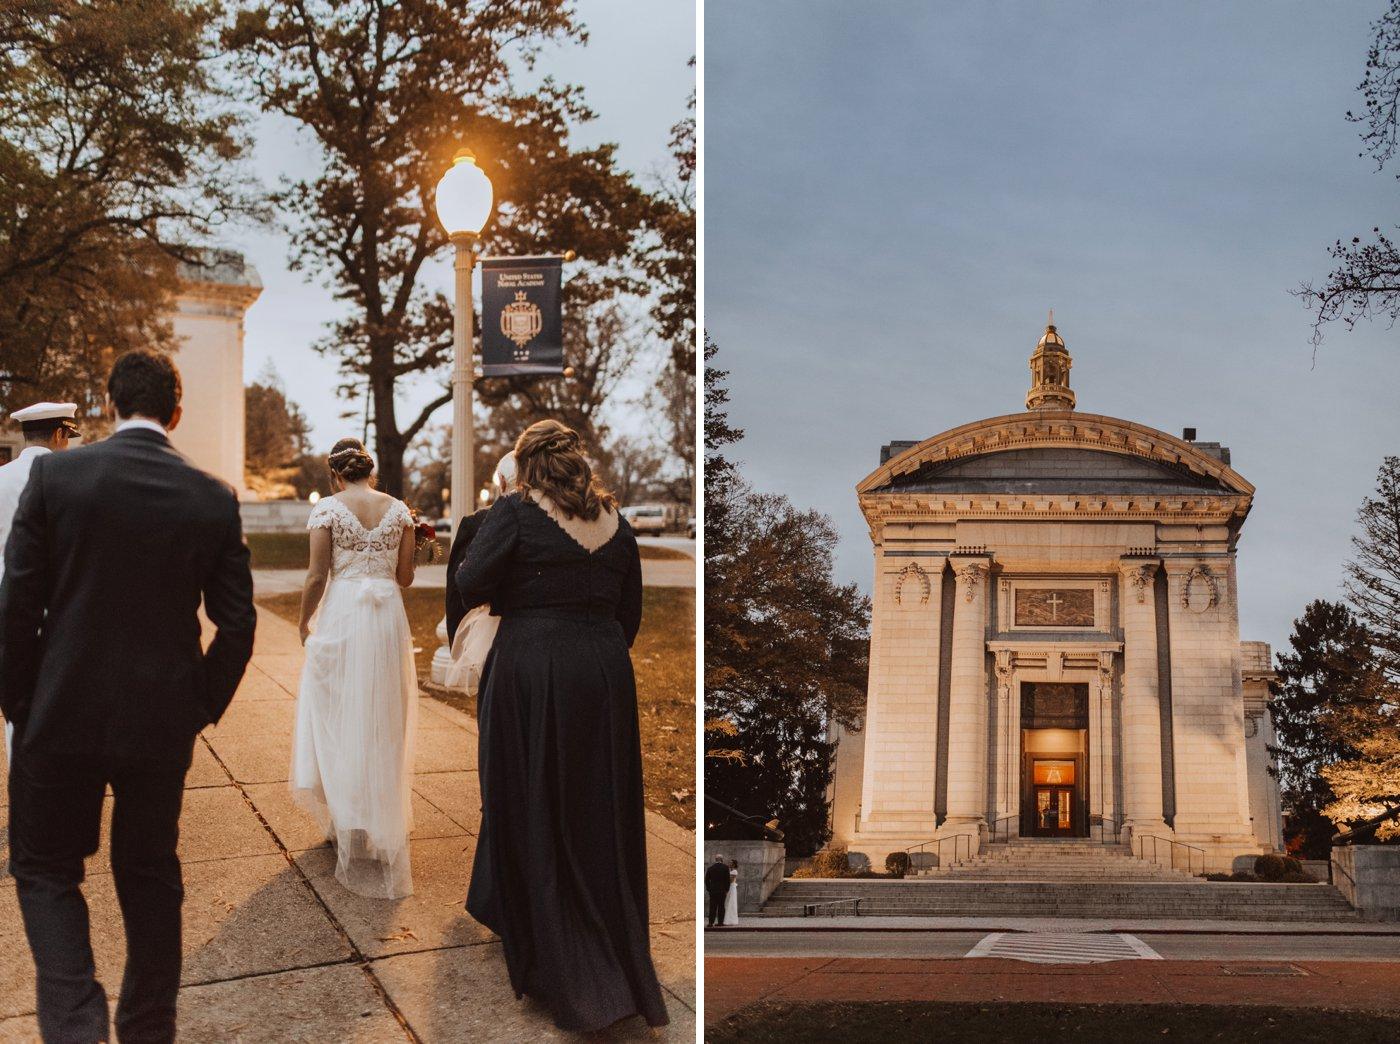 USNA chapel wedding Downtown Annapolis Maryland wedding photographer